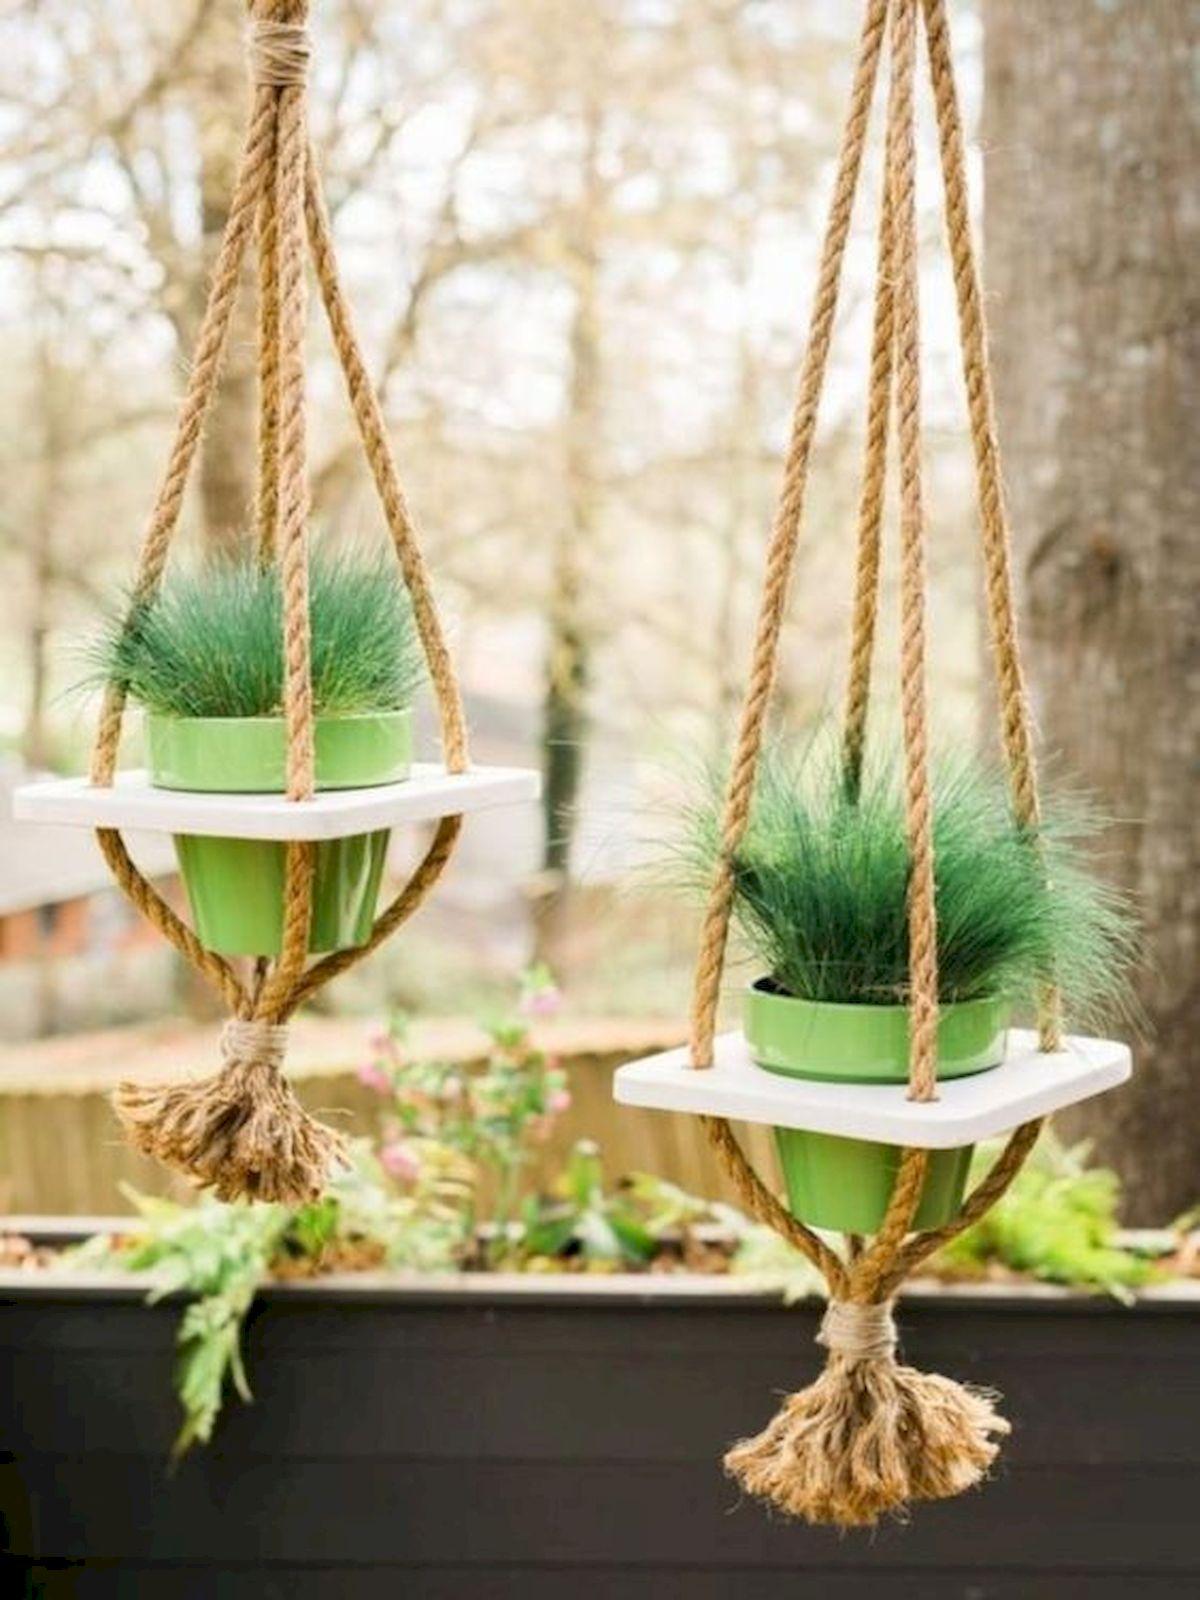 50 Awesome DIY Hanging Plants Ideas For Modern Backyard Garden (42)